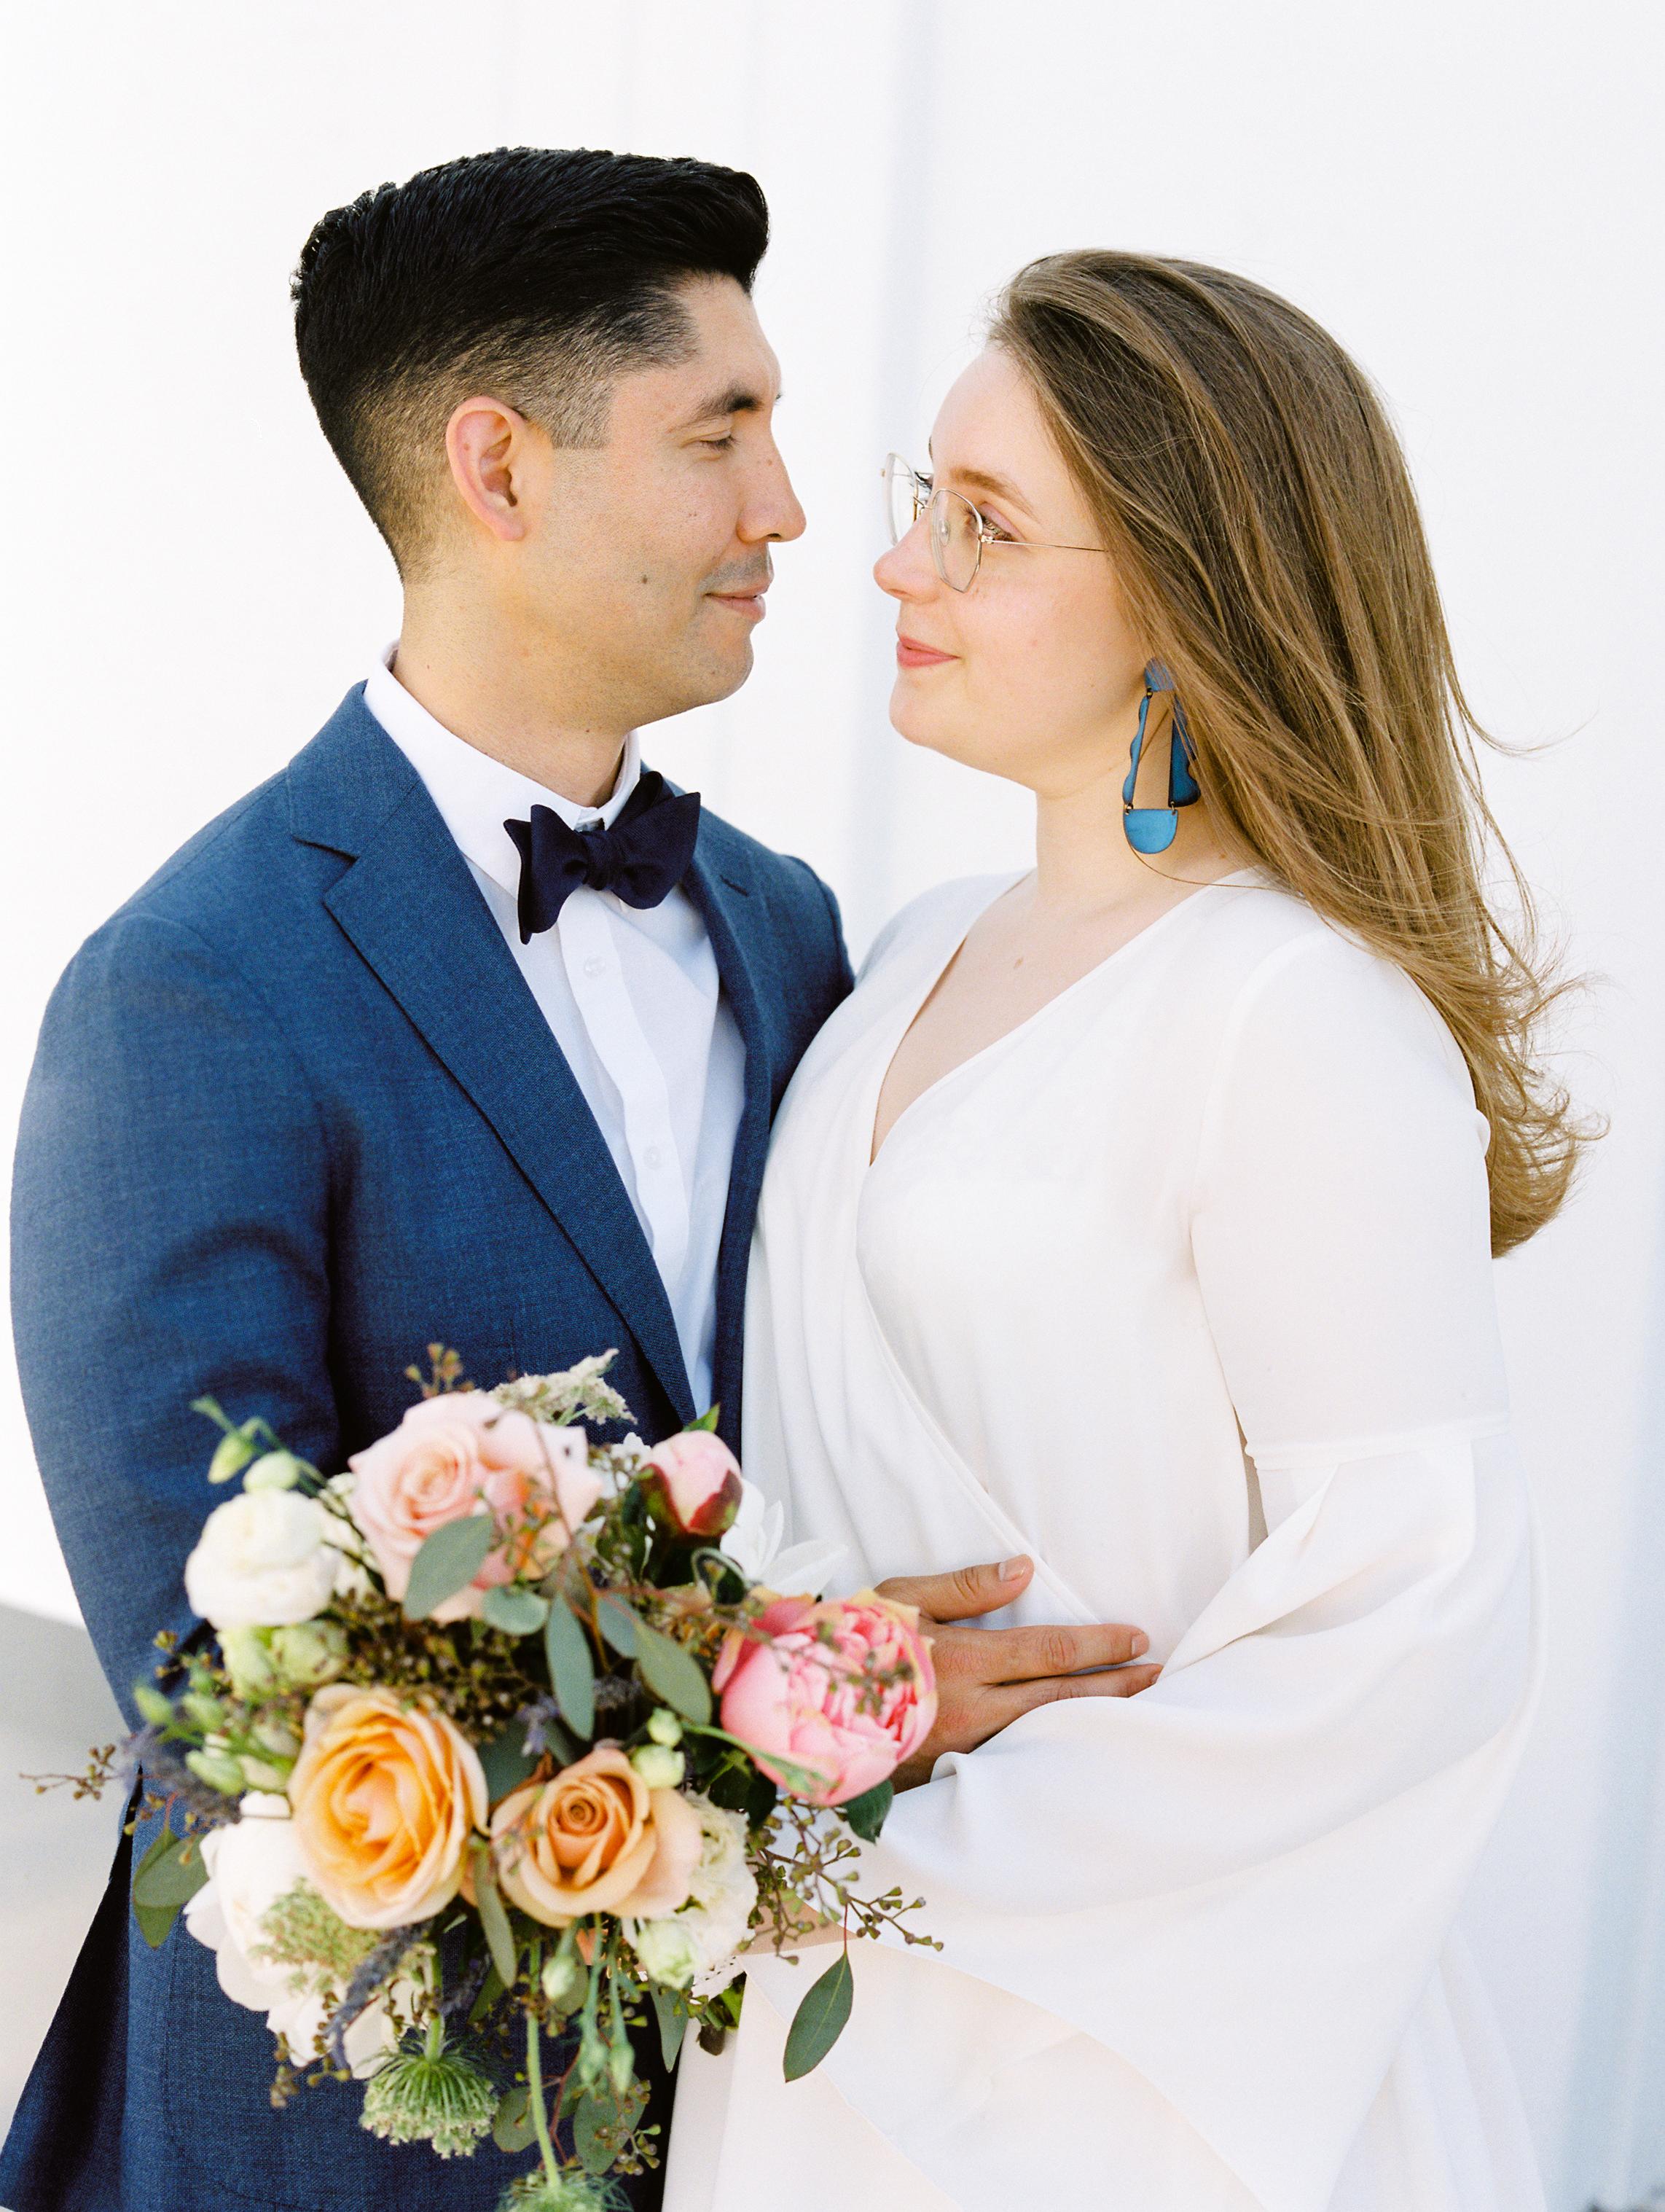 Best-Austin-Texas-Marfa-Wedding-Photographers-fine-art-film-144.jpg